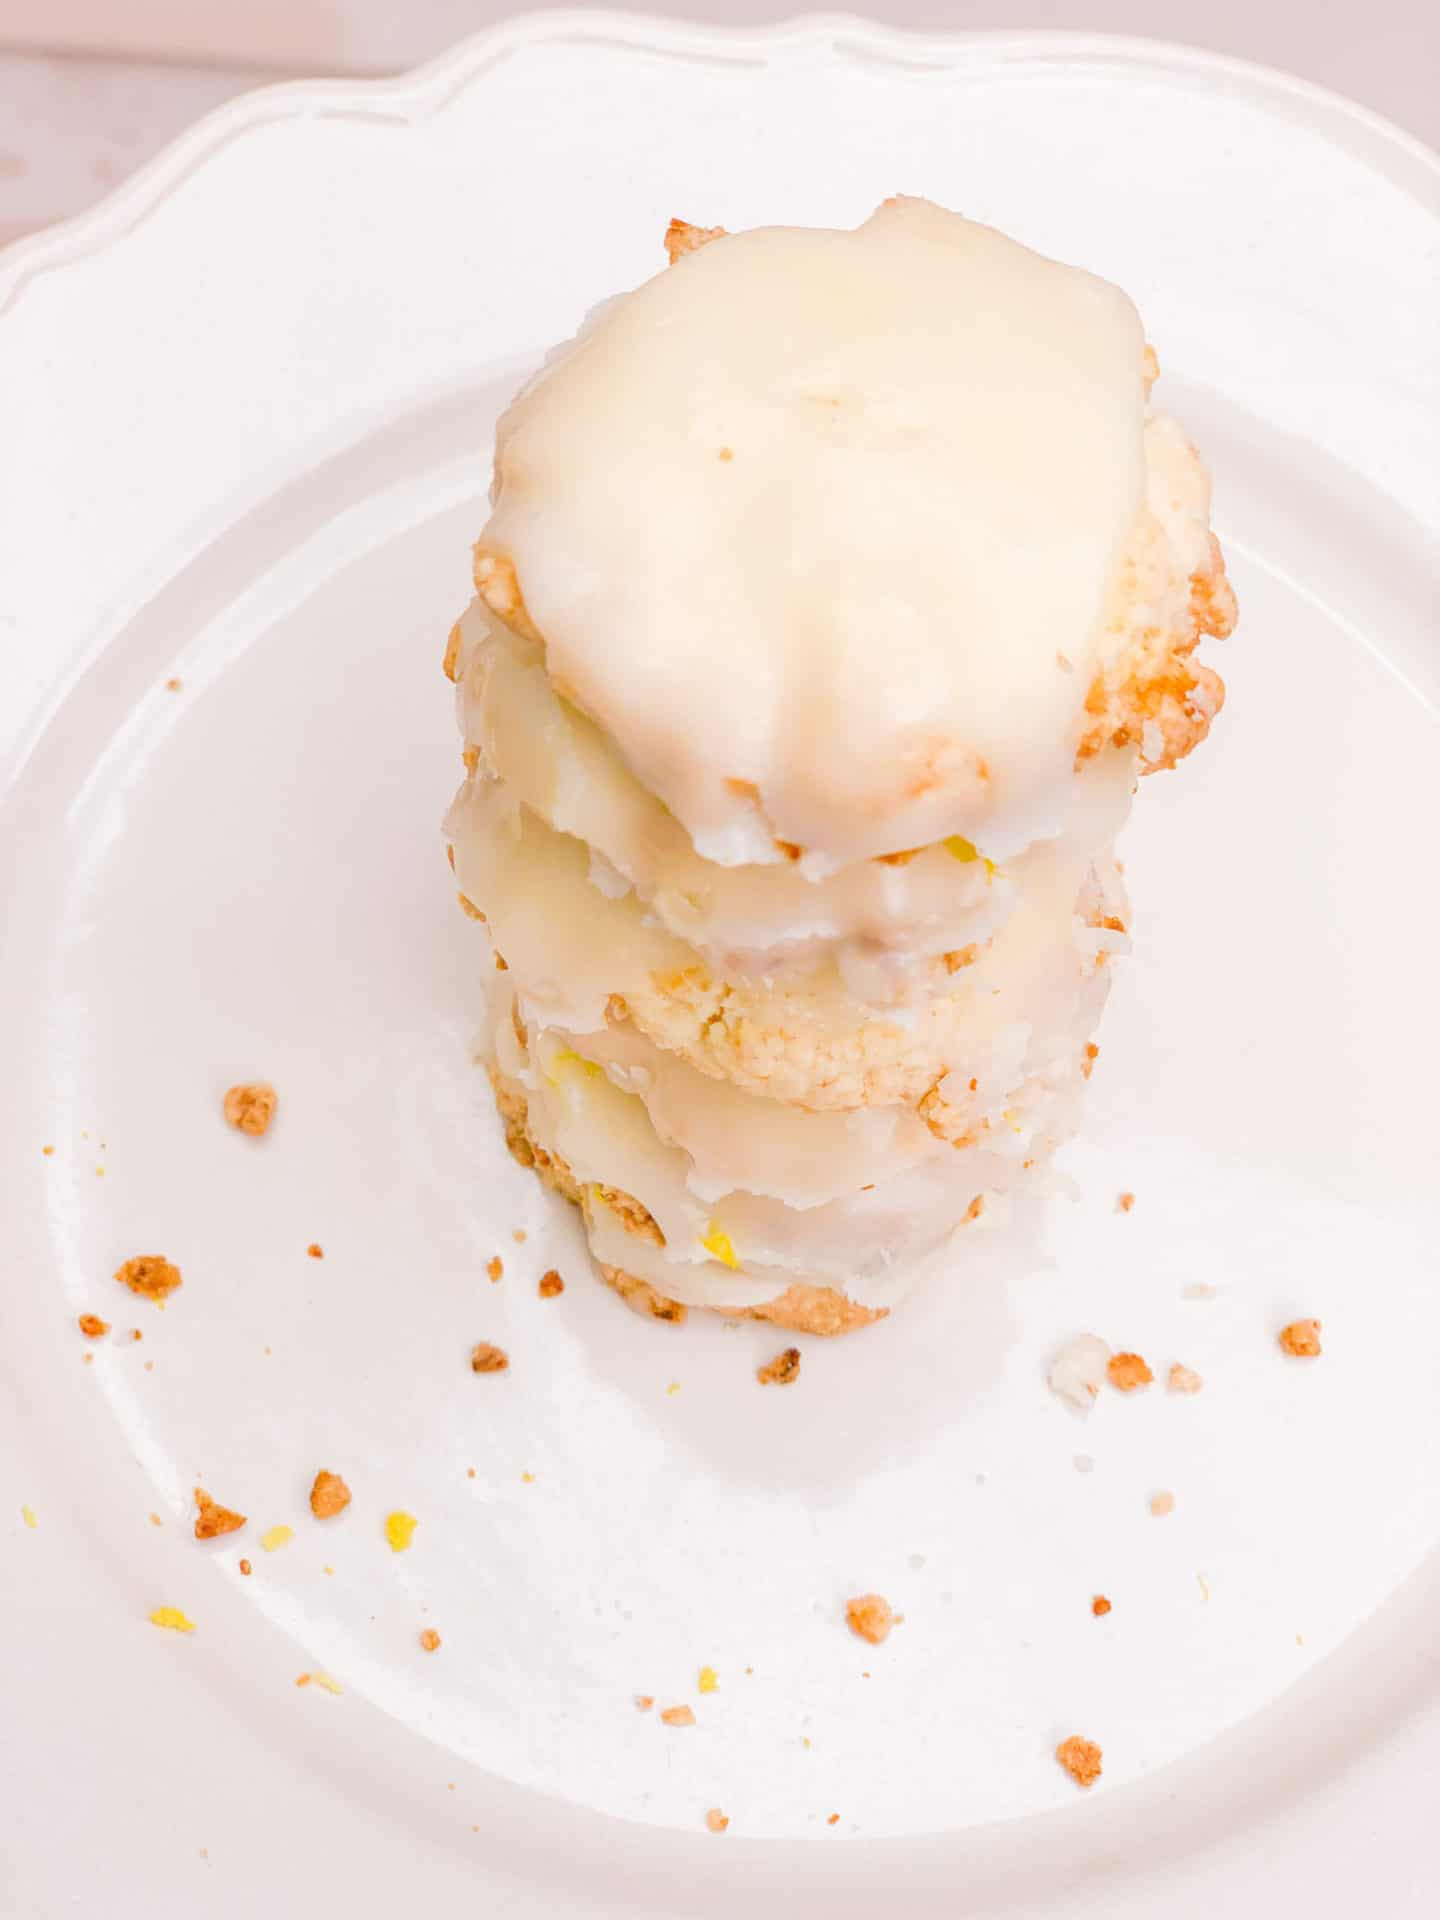 Icing & Glazed Lemon Meltaway Cookies